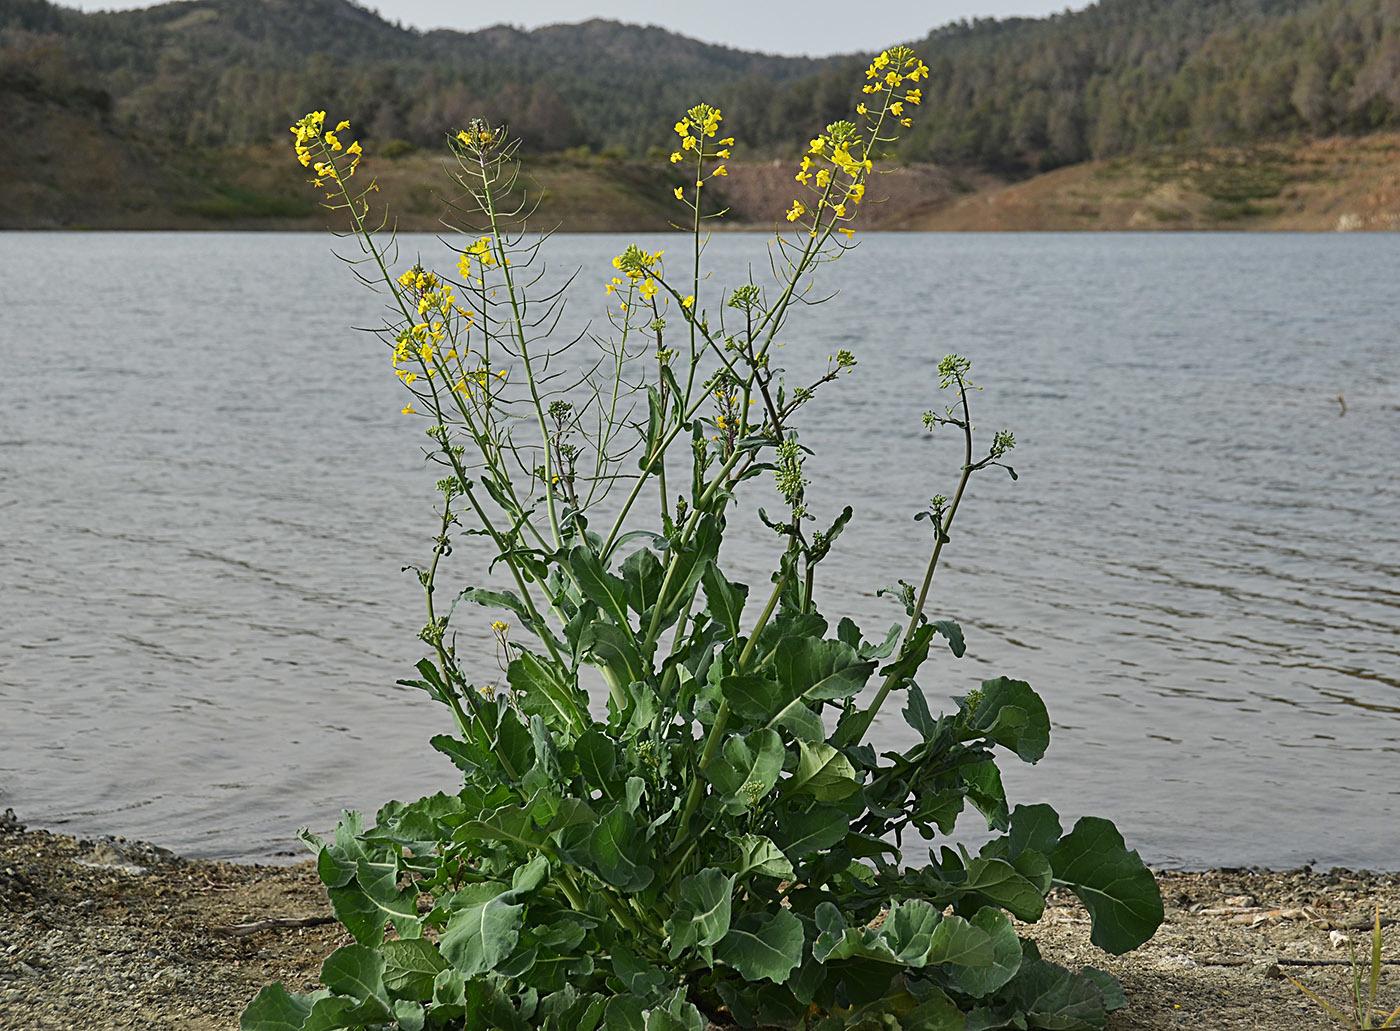 https://pictures.bgbm.org/digilib/Scaler?fn=Cyprus/Brassica_napus_A1.jpg&mo=file